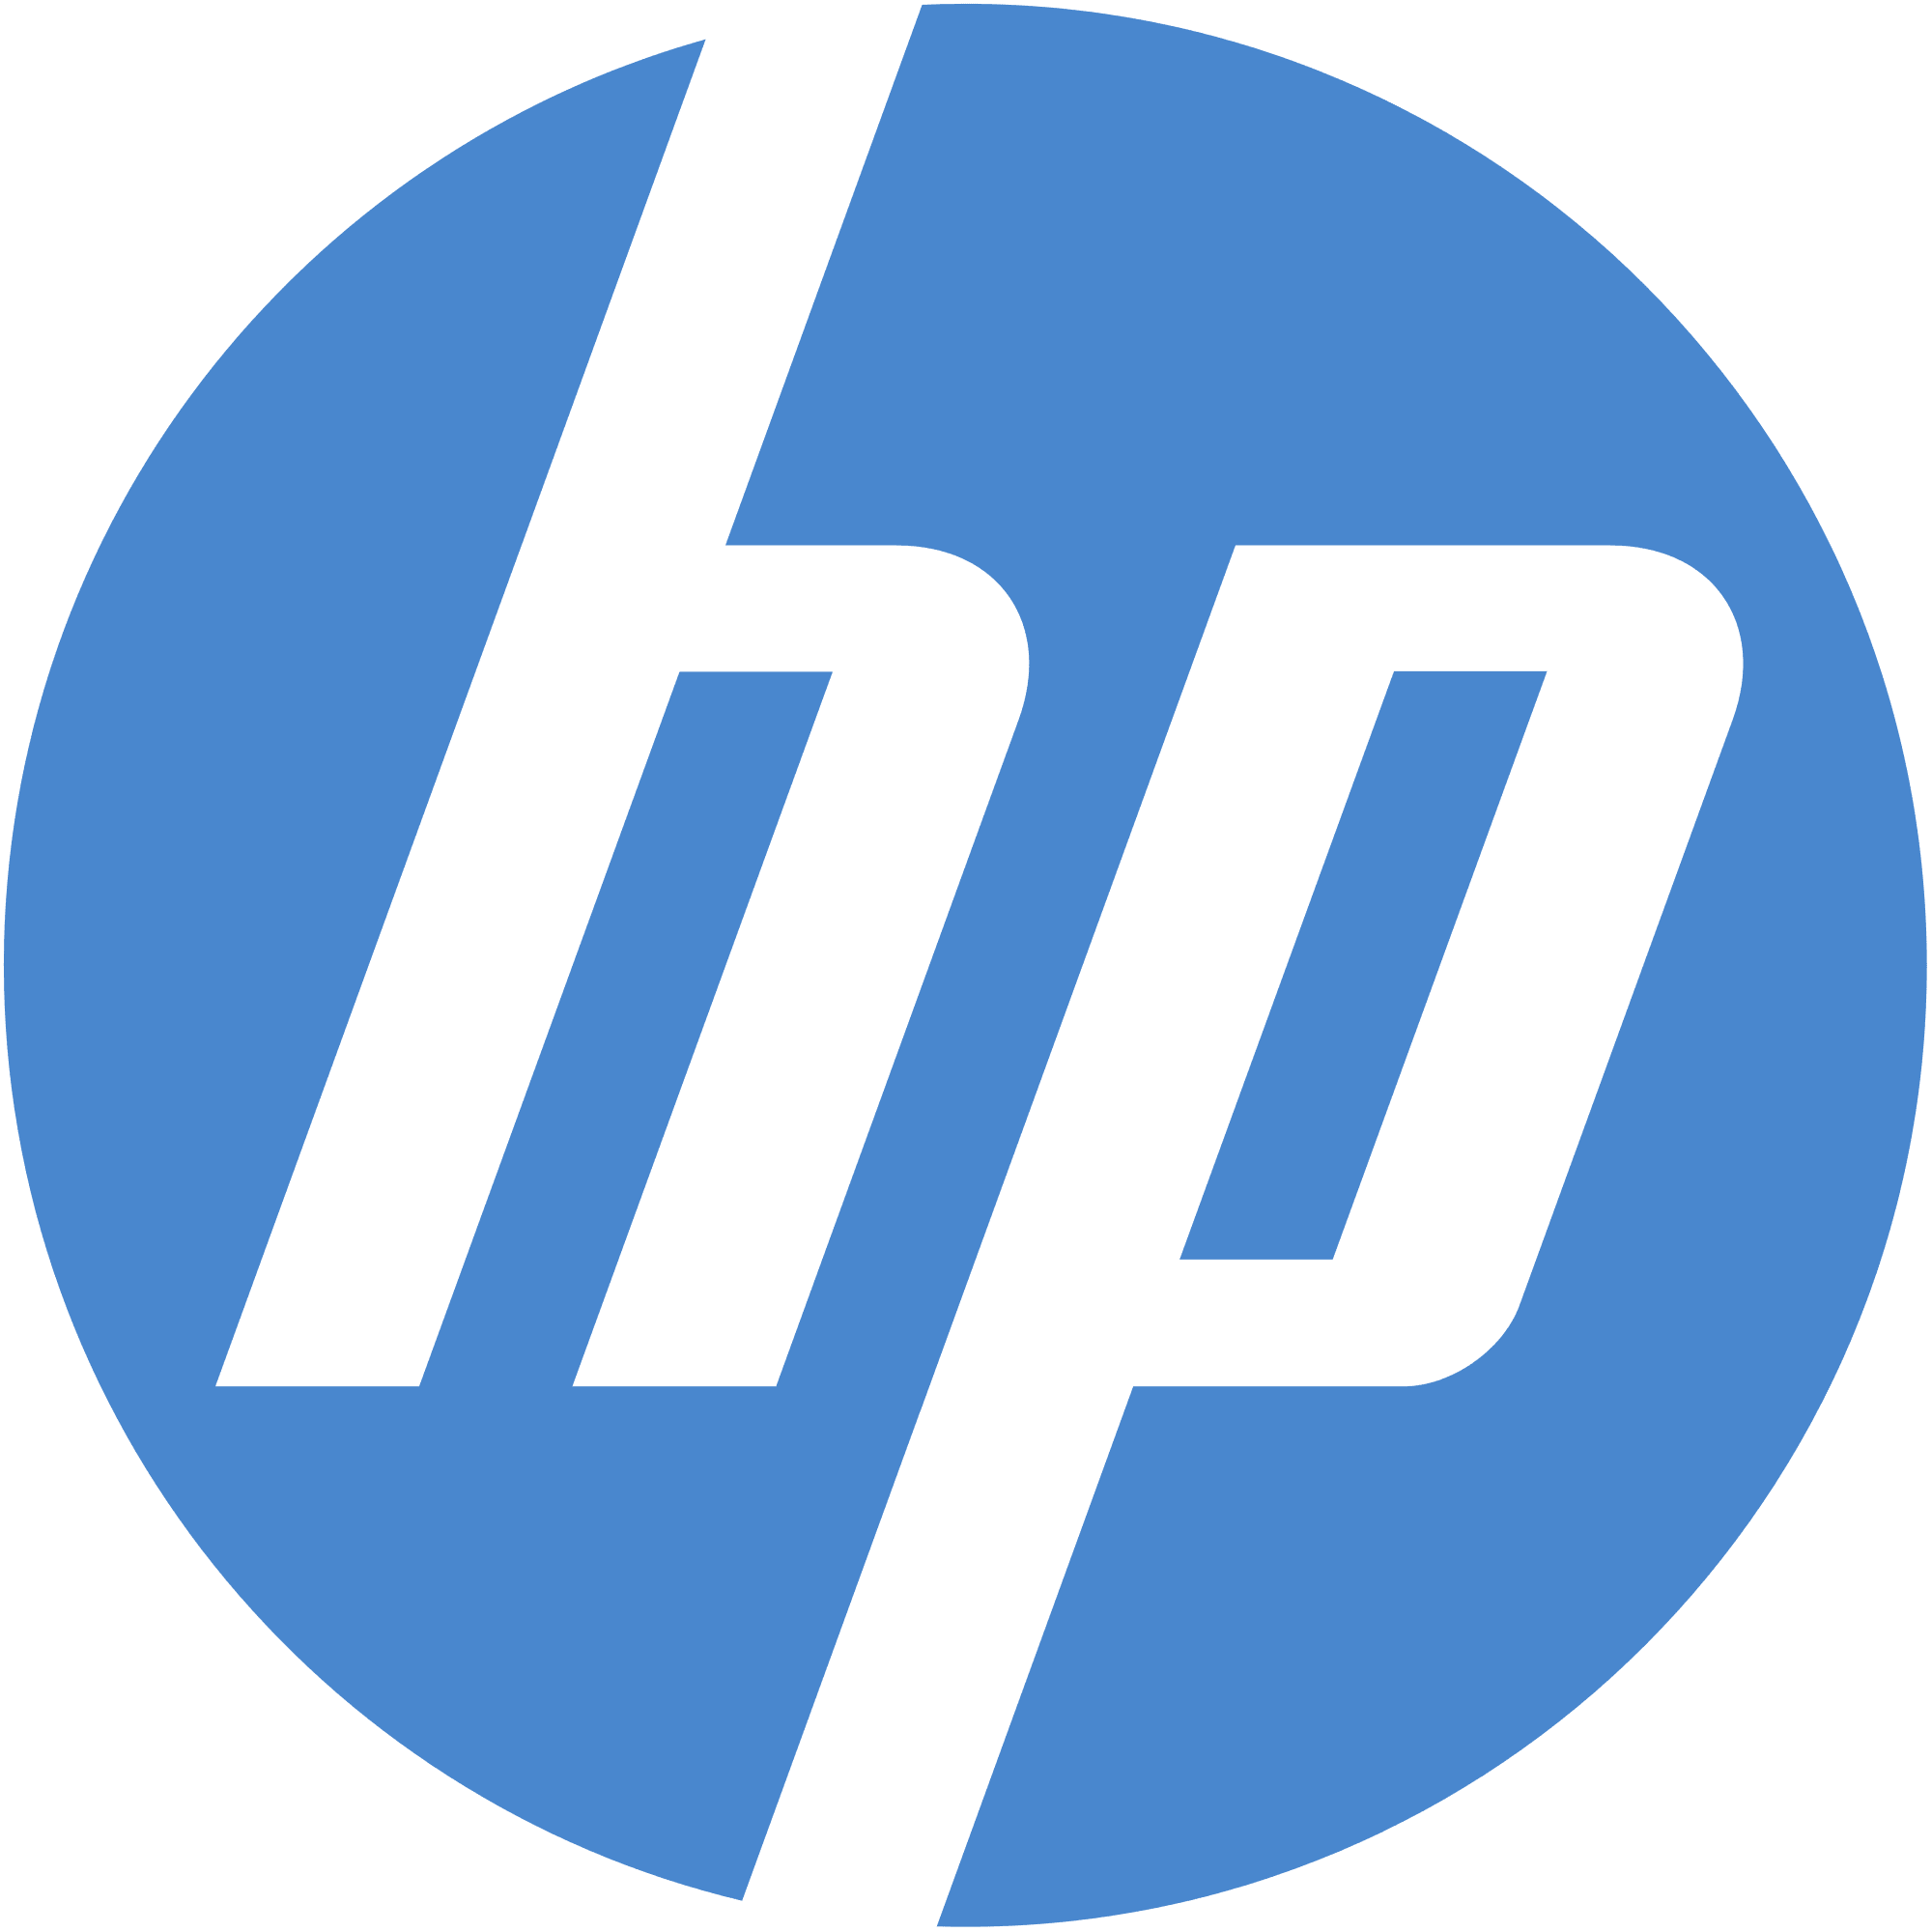 HP Compaq LA2205wg 22-inch Widescreen LCD Monitor drivers